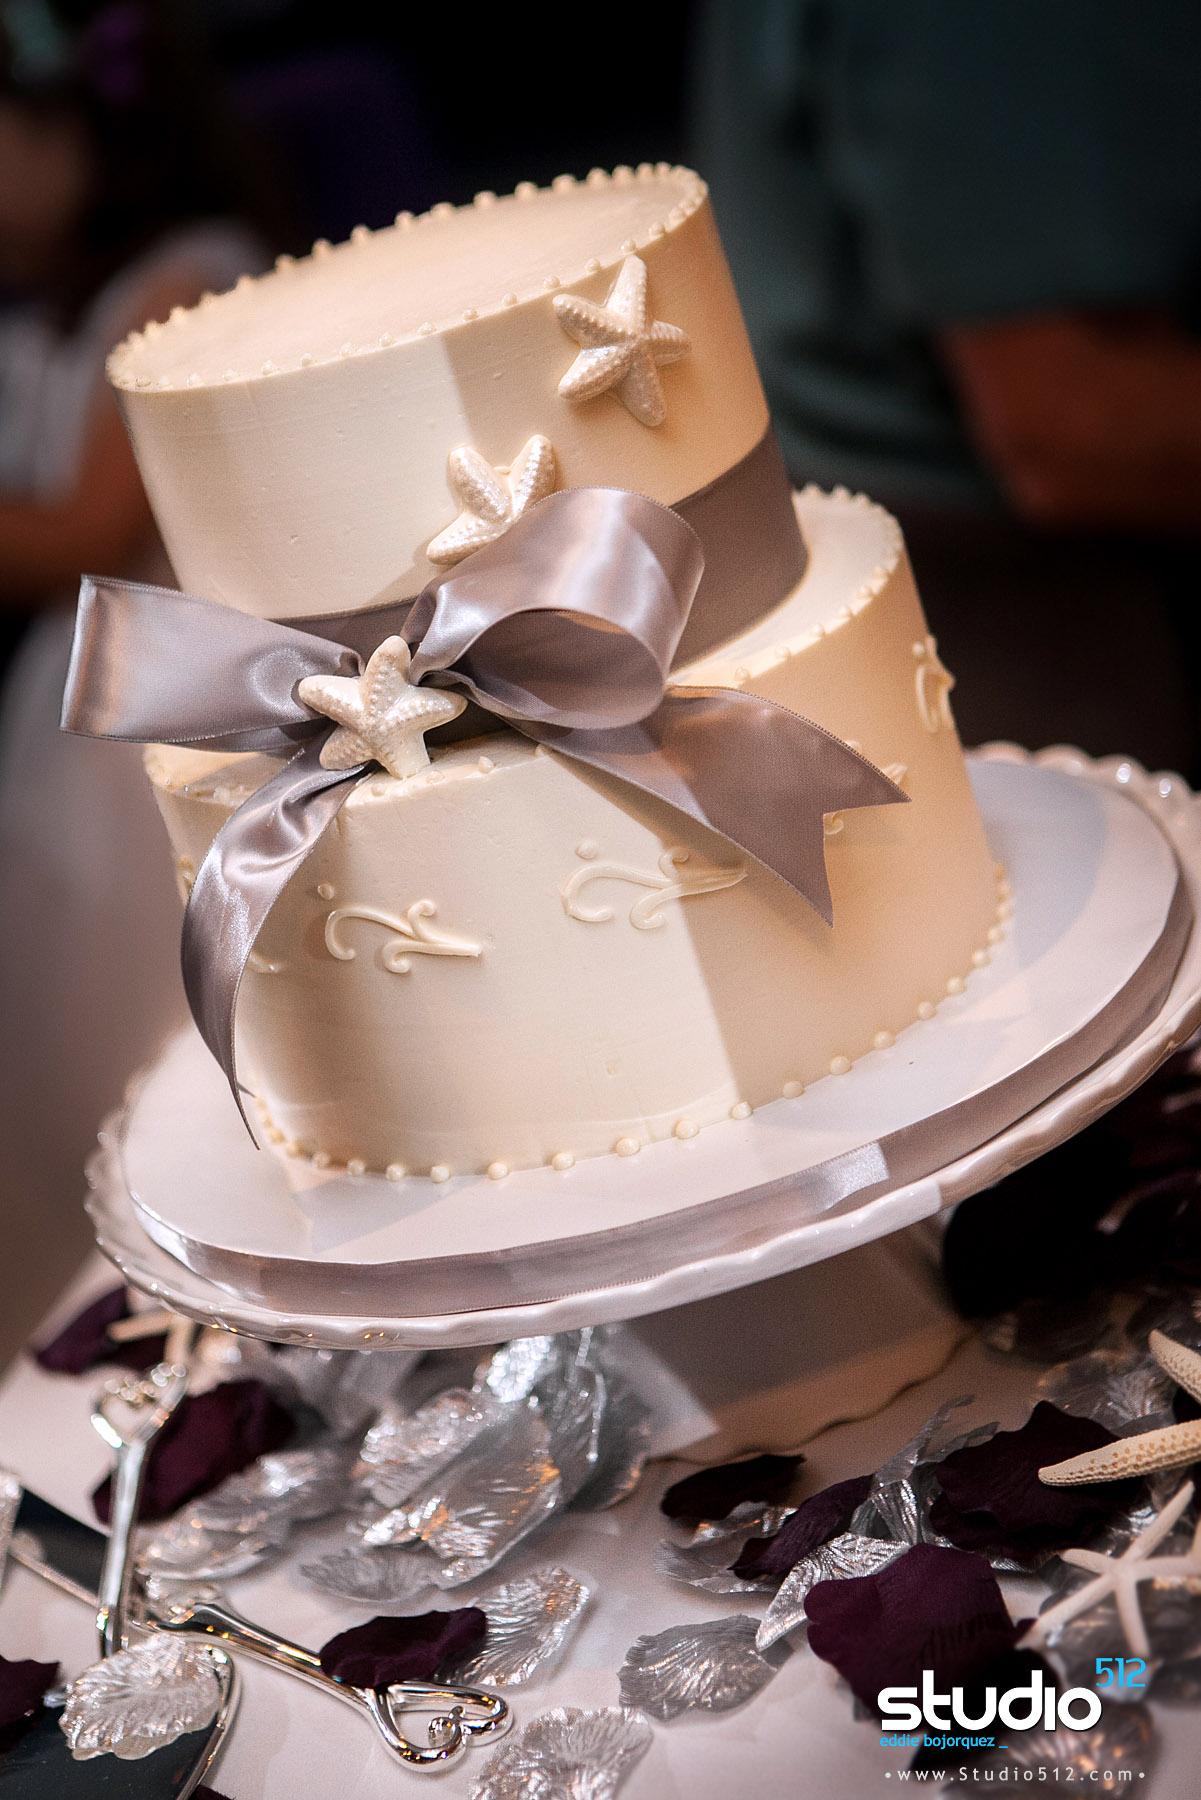 small-wedding-cake-with-white-chocolate-shells-studdio-512-photo-for-joseph